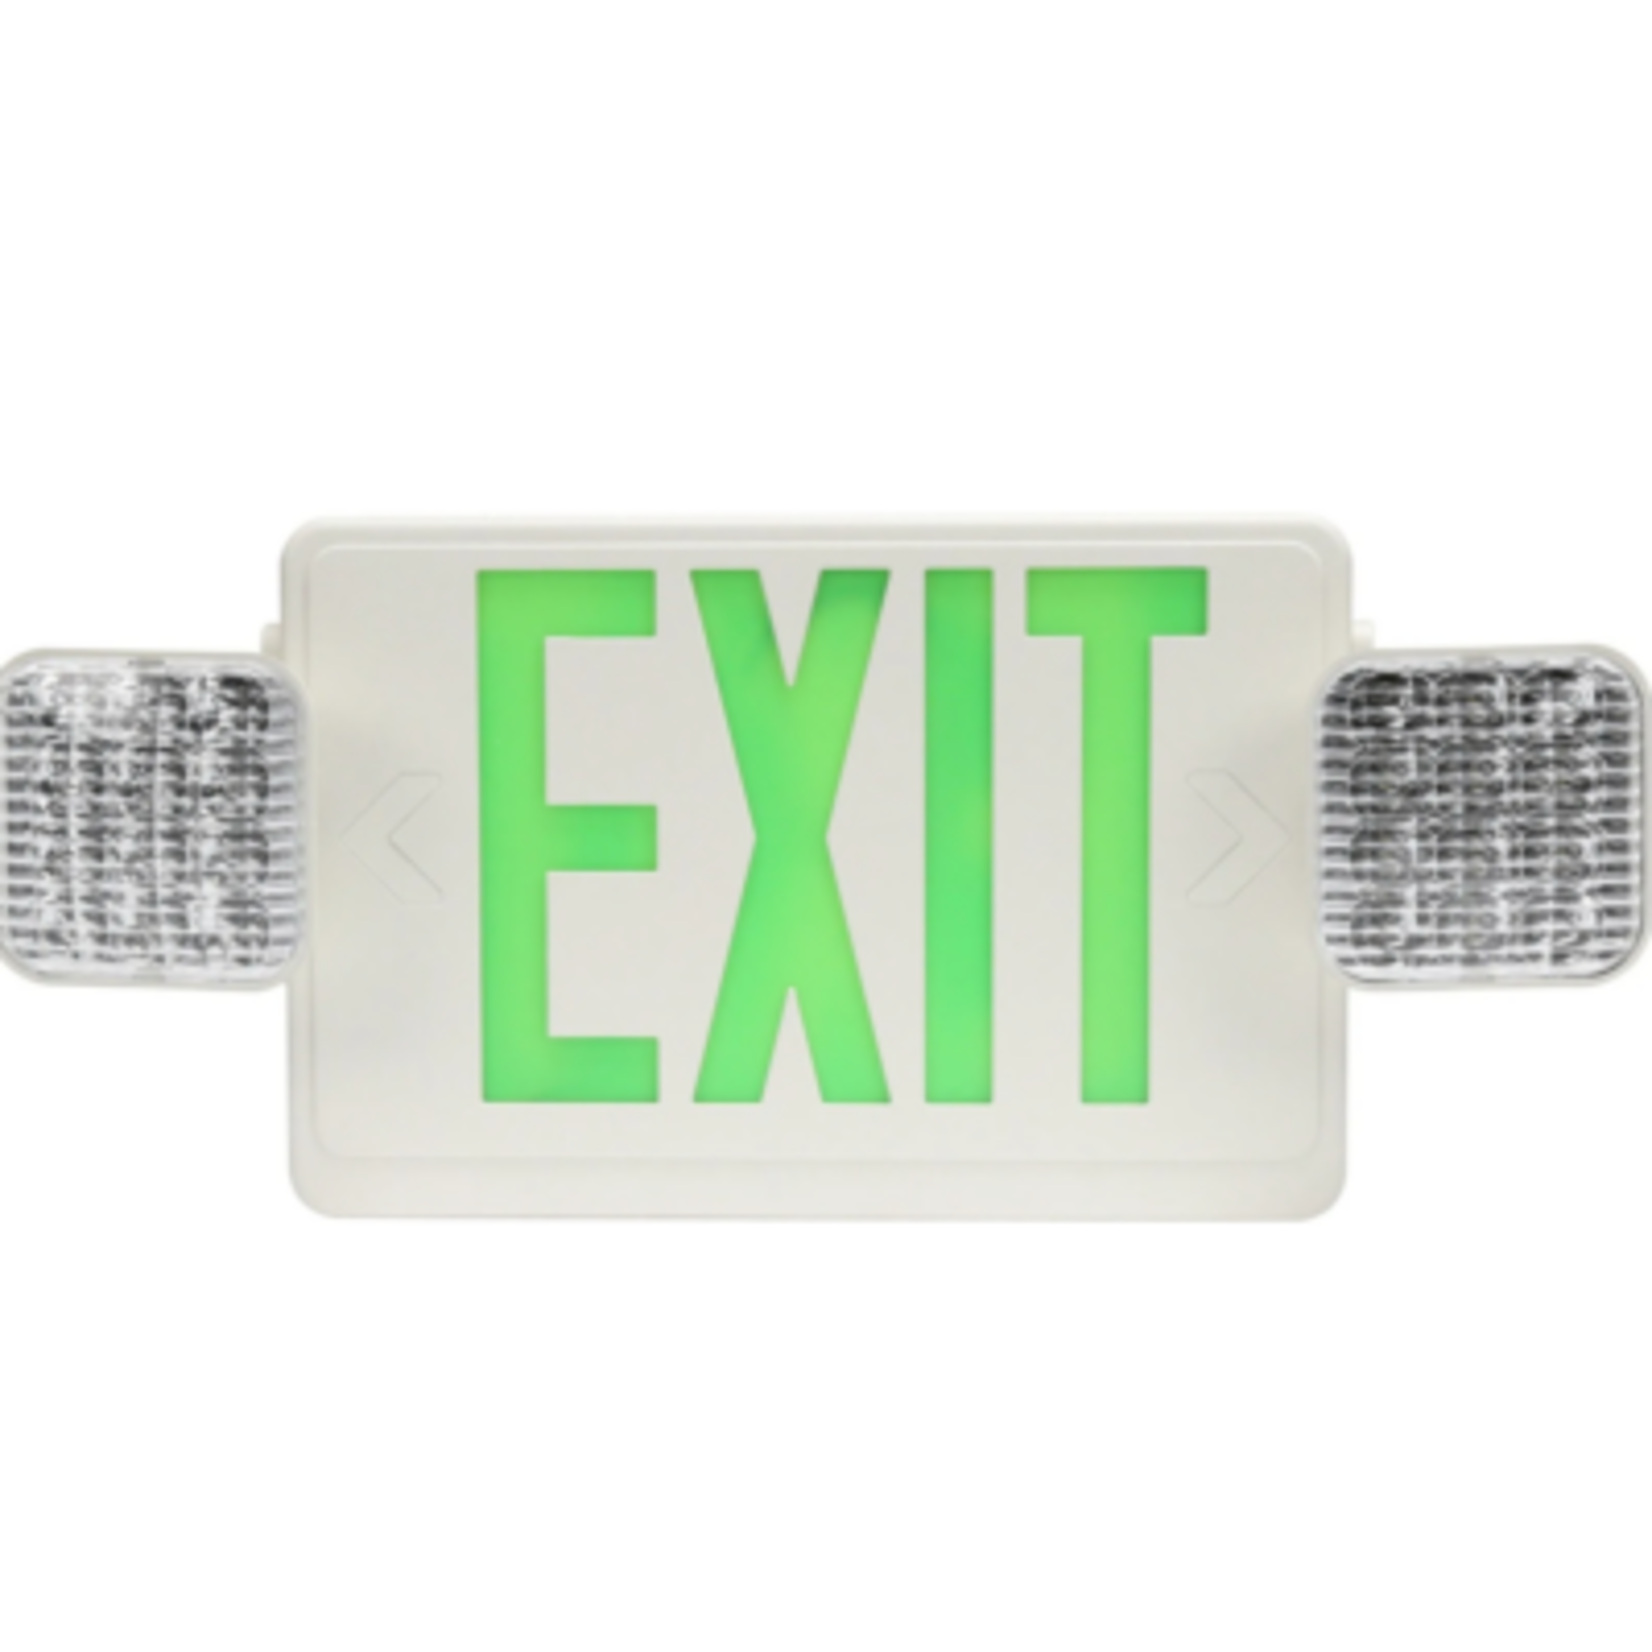 6677 Econolight LED Exit/Emergency Light Combo Sign